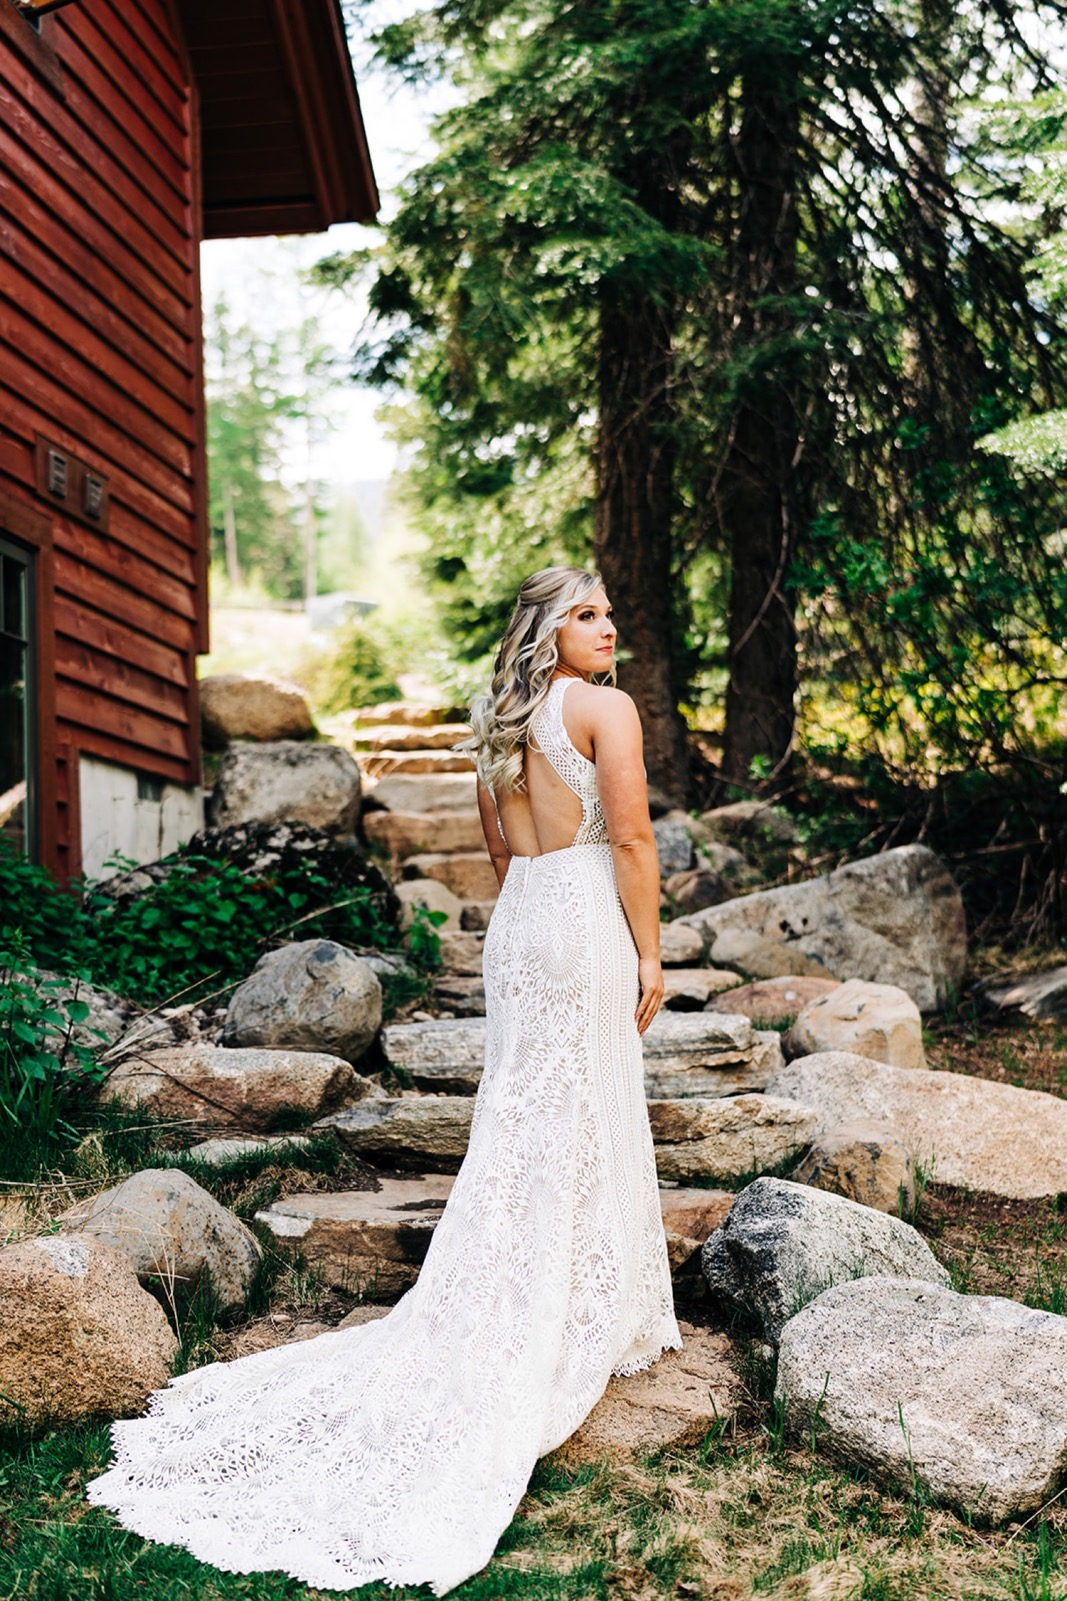 020_falissa_heather_wedding-48.jpg